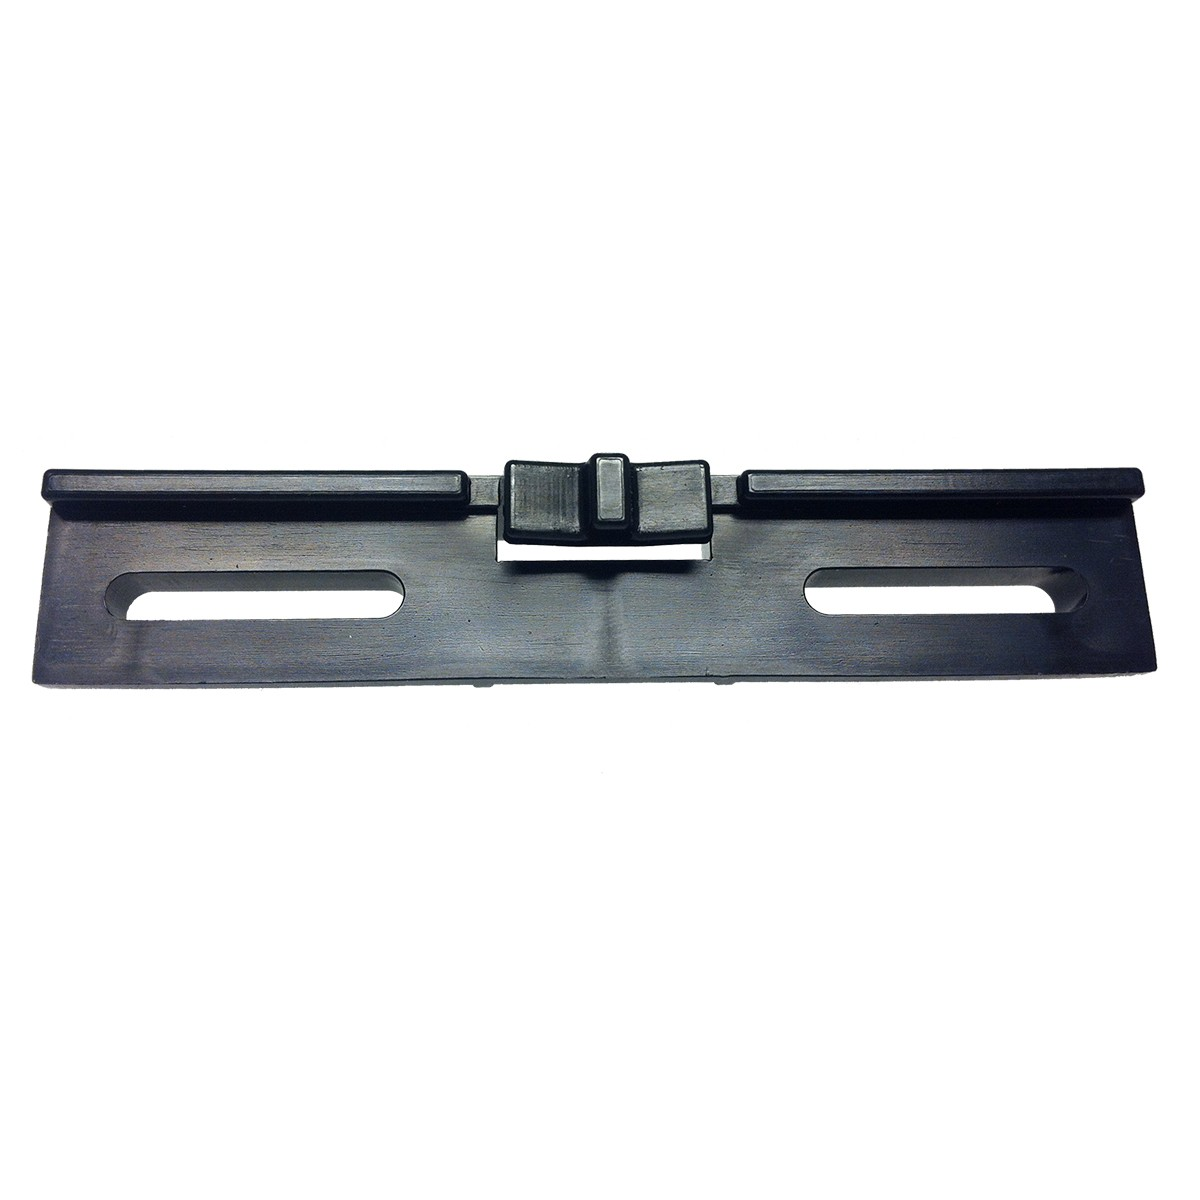 Solidscape Plate Slider Lock For 3Z Series